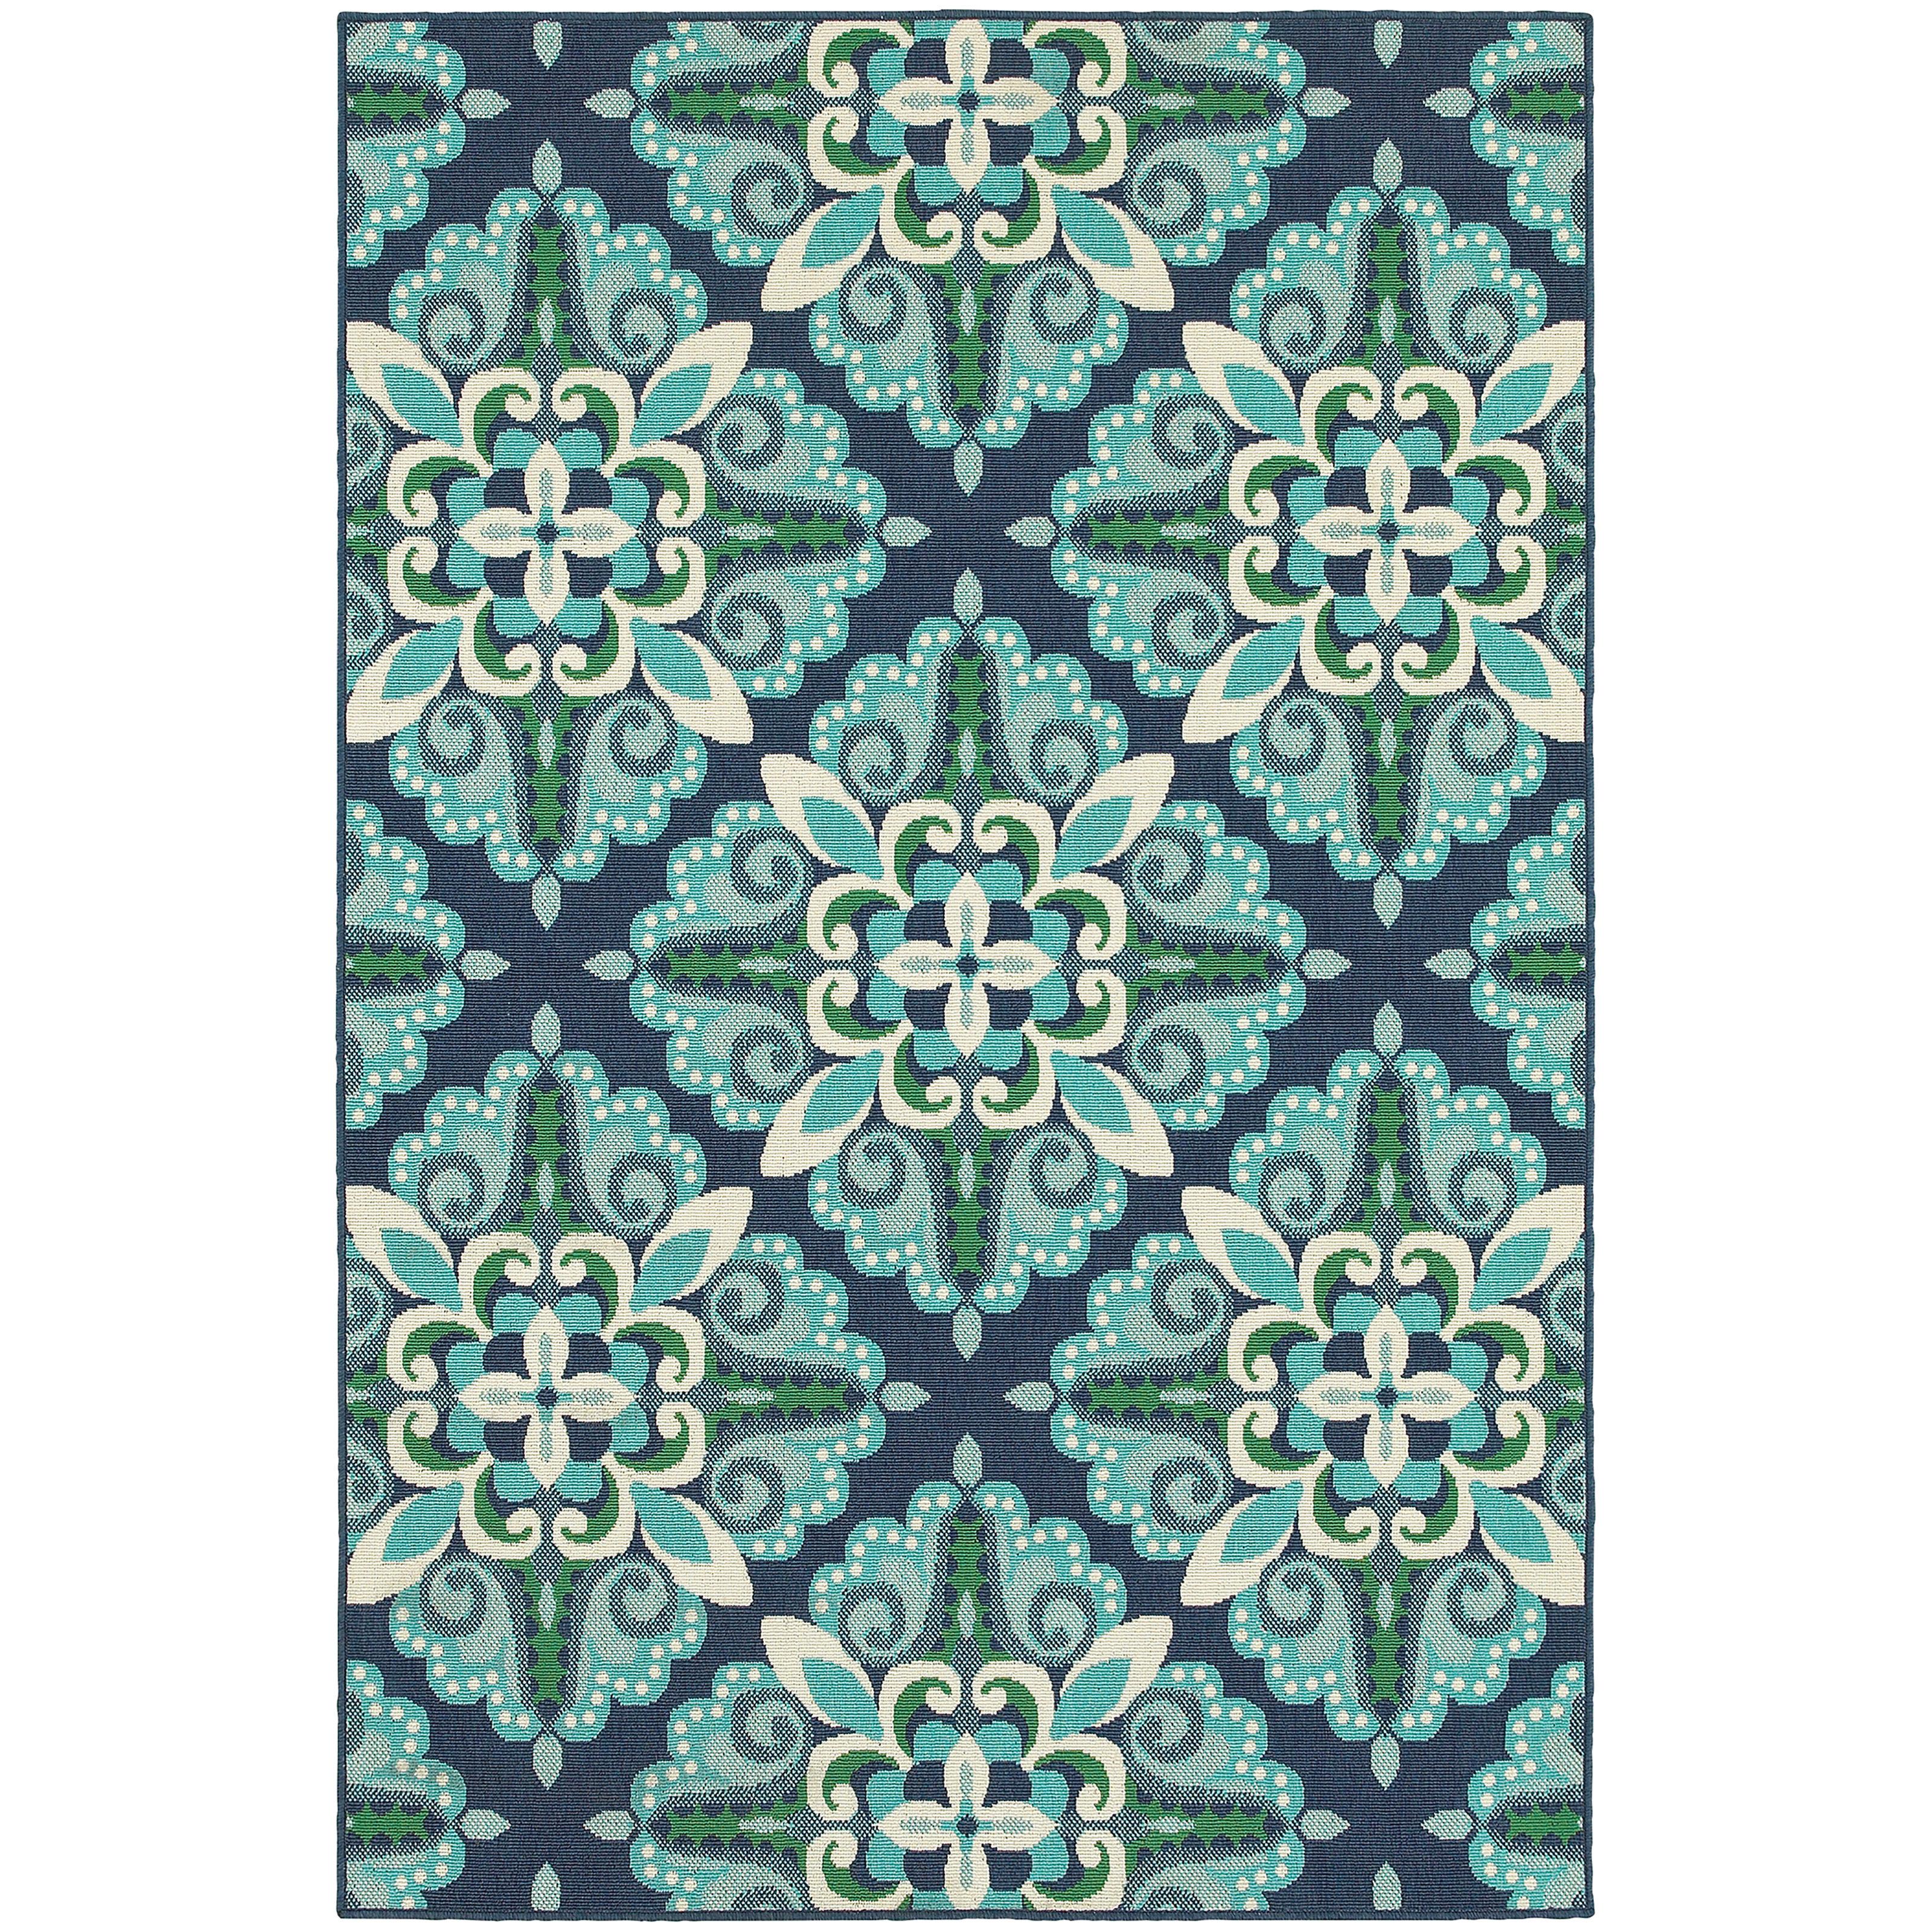 Beachcrest home kailani contemporary blue green indoor outdoor area rug reviews wayfair